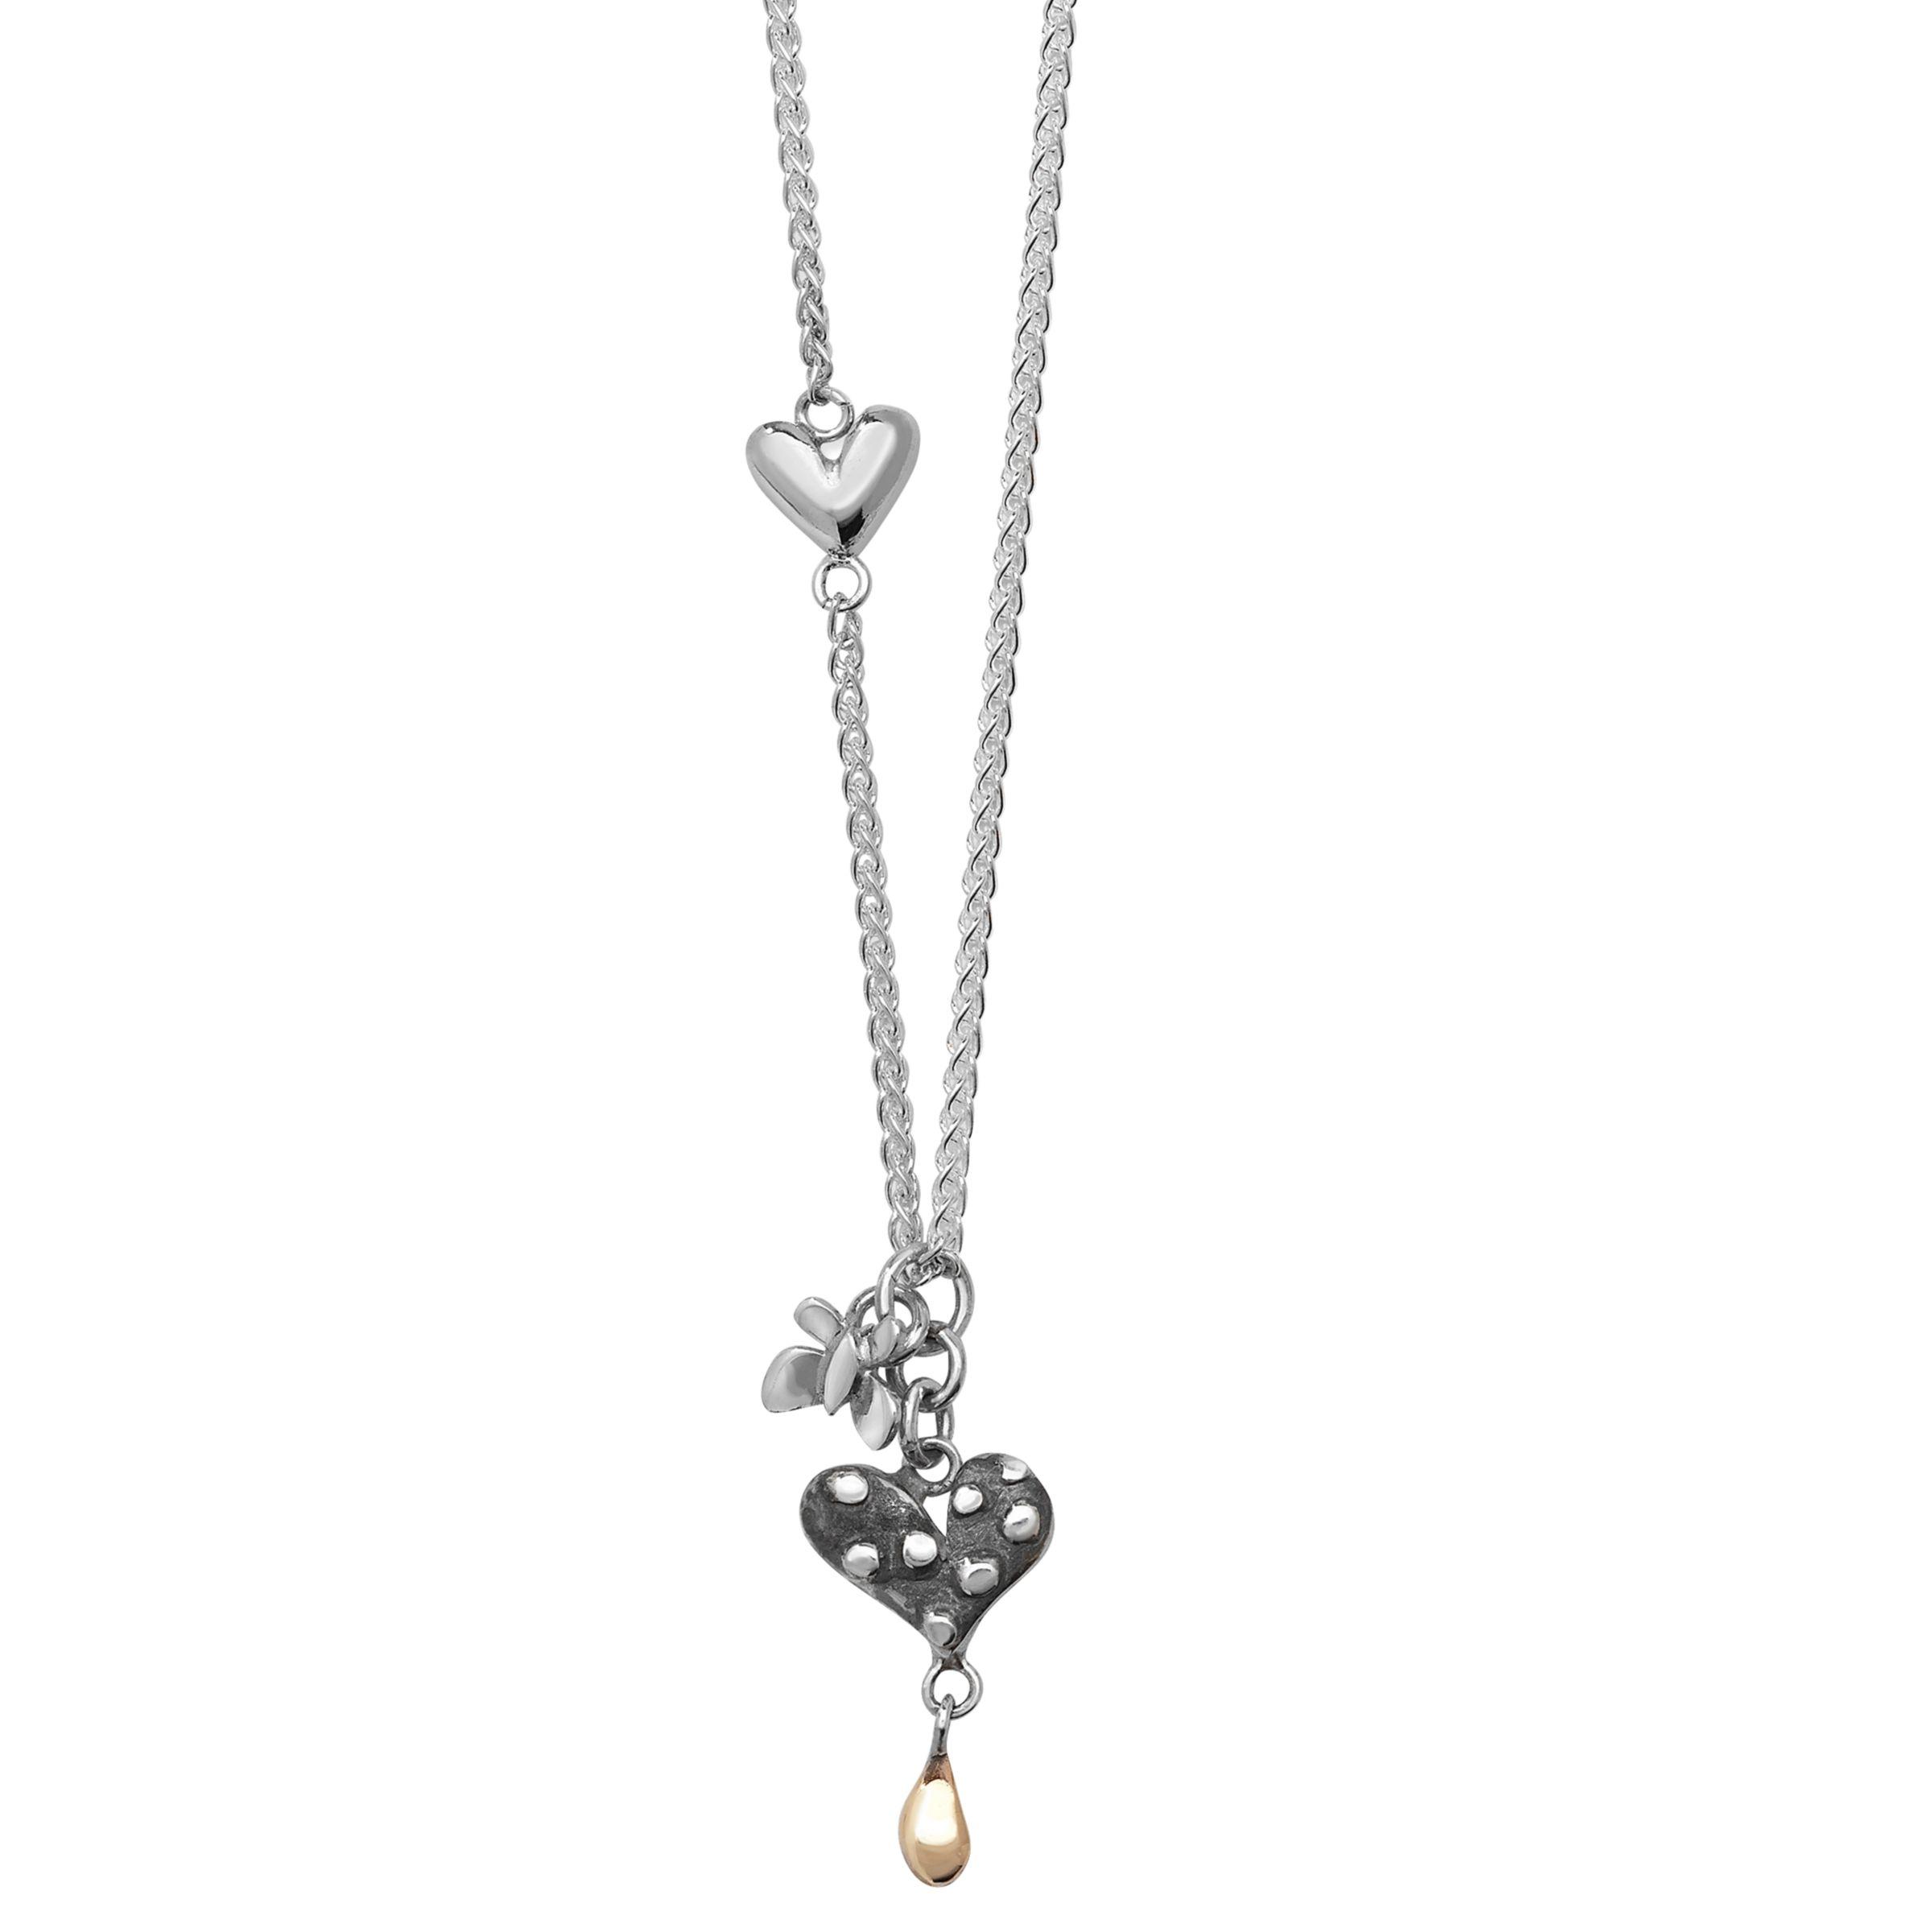 Linda Macdonald Dotty Heart Butterfly Gold Dew Drop Necklace